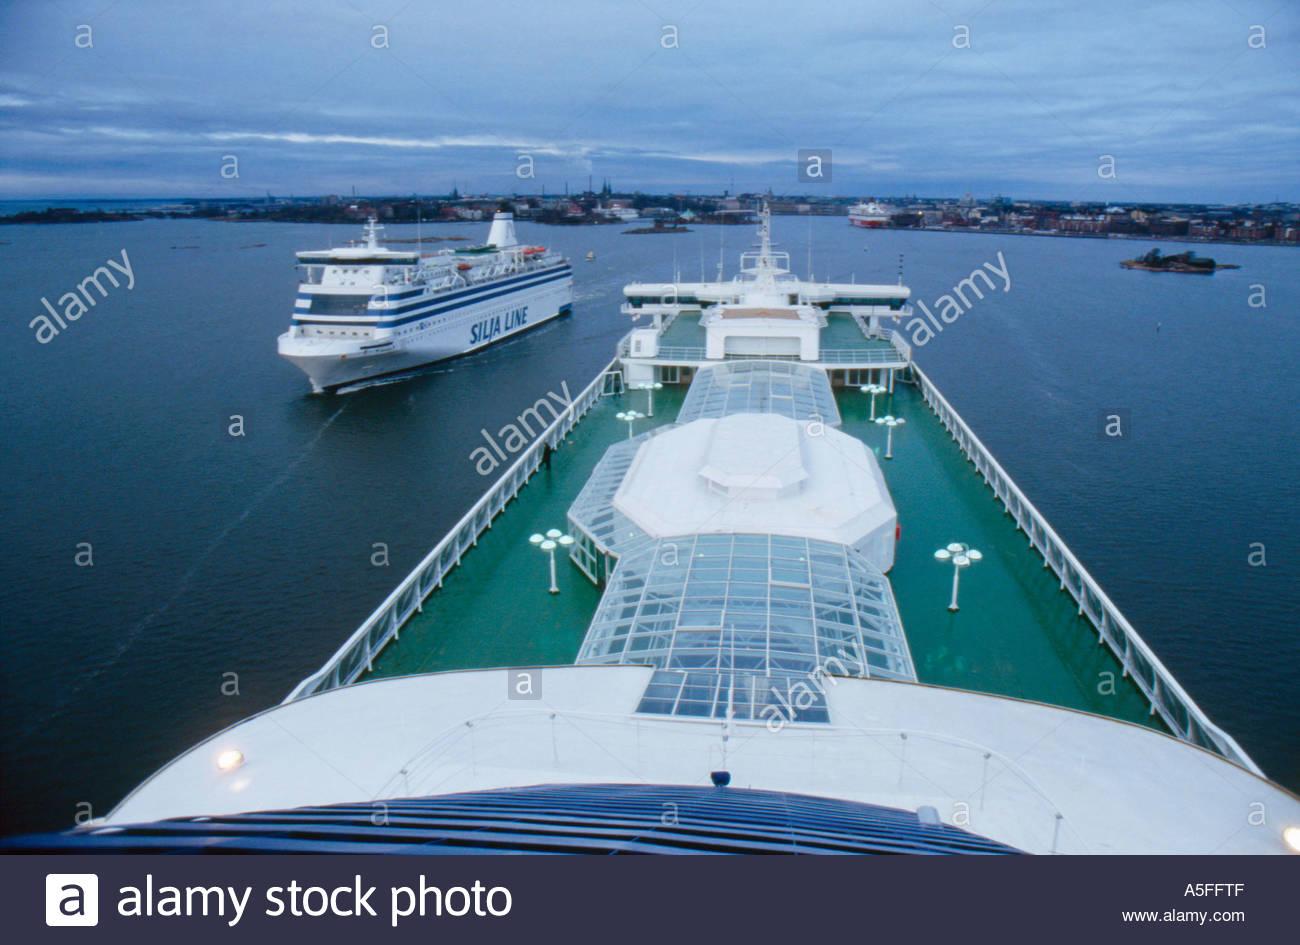 Ferryboats entering leaving the port of Helsinki Finland - Stock Image